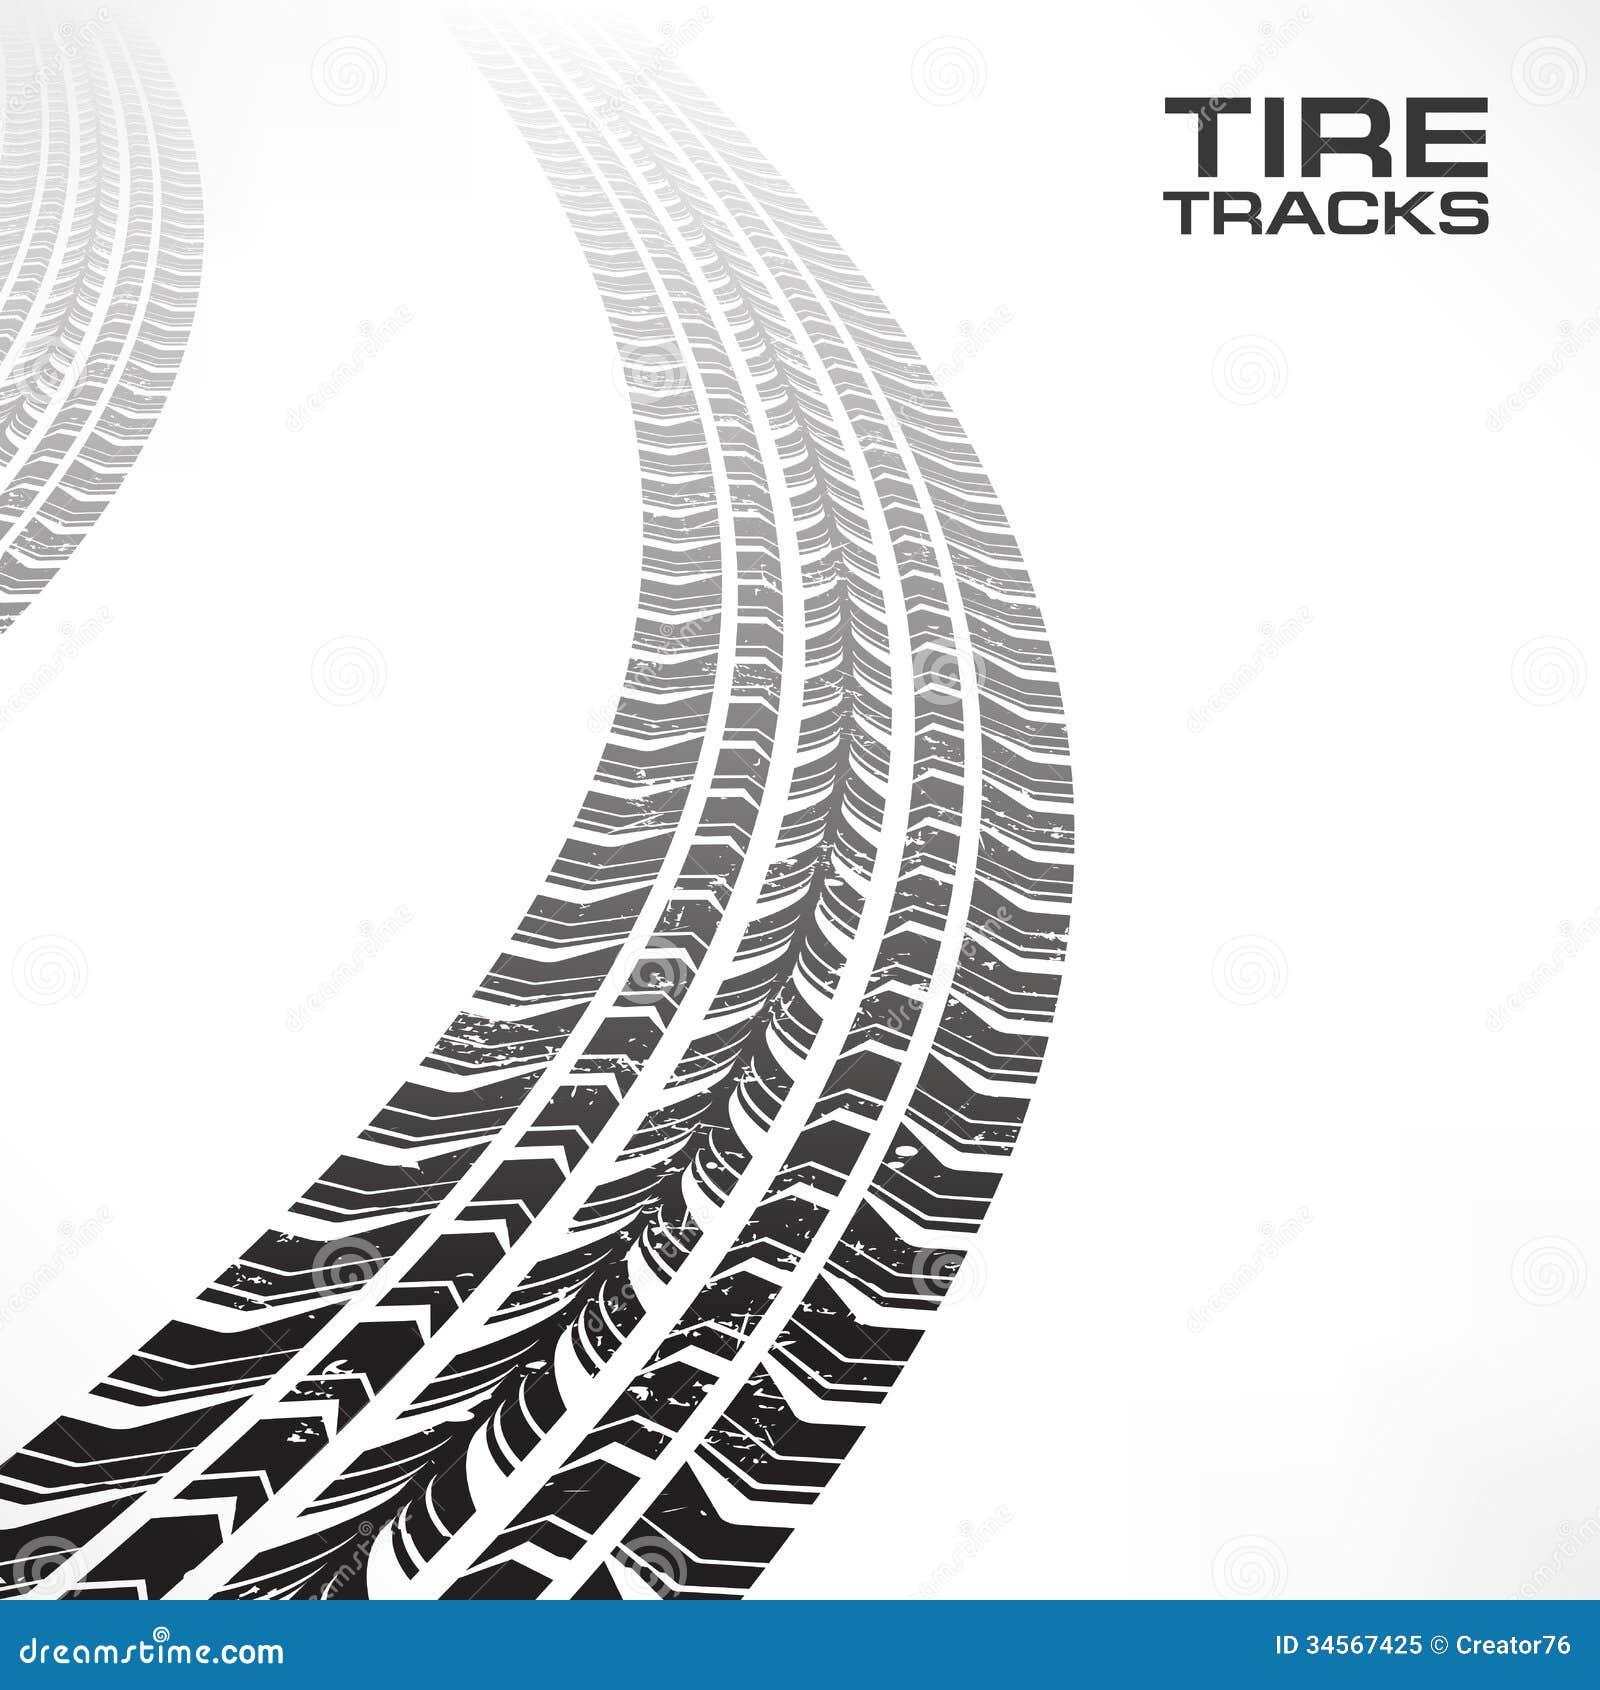 vector clipart tire tracks - photo #6